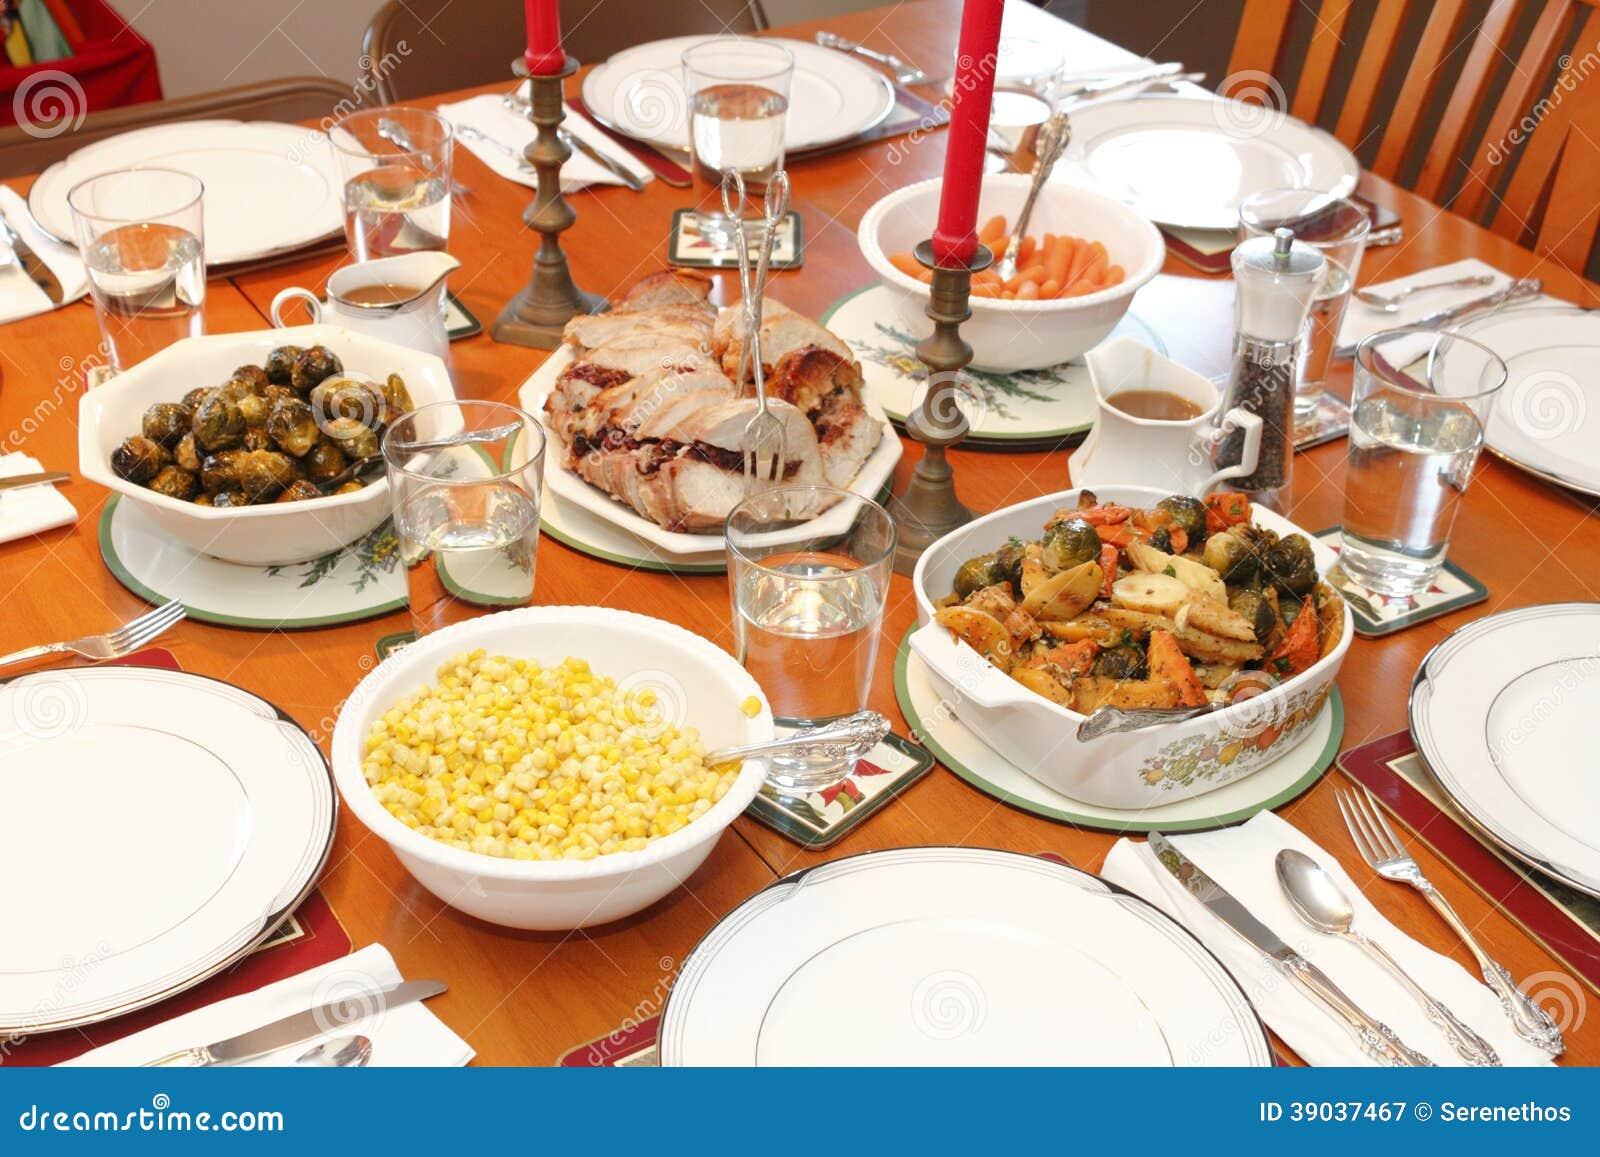 Christmas Dinner Stock Photo Image 39037467